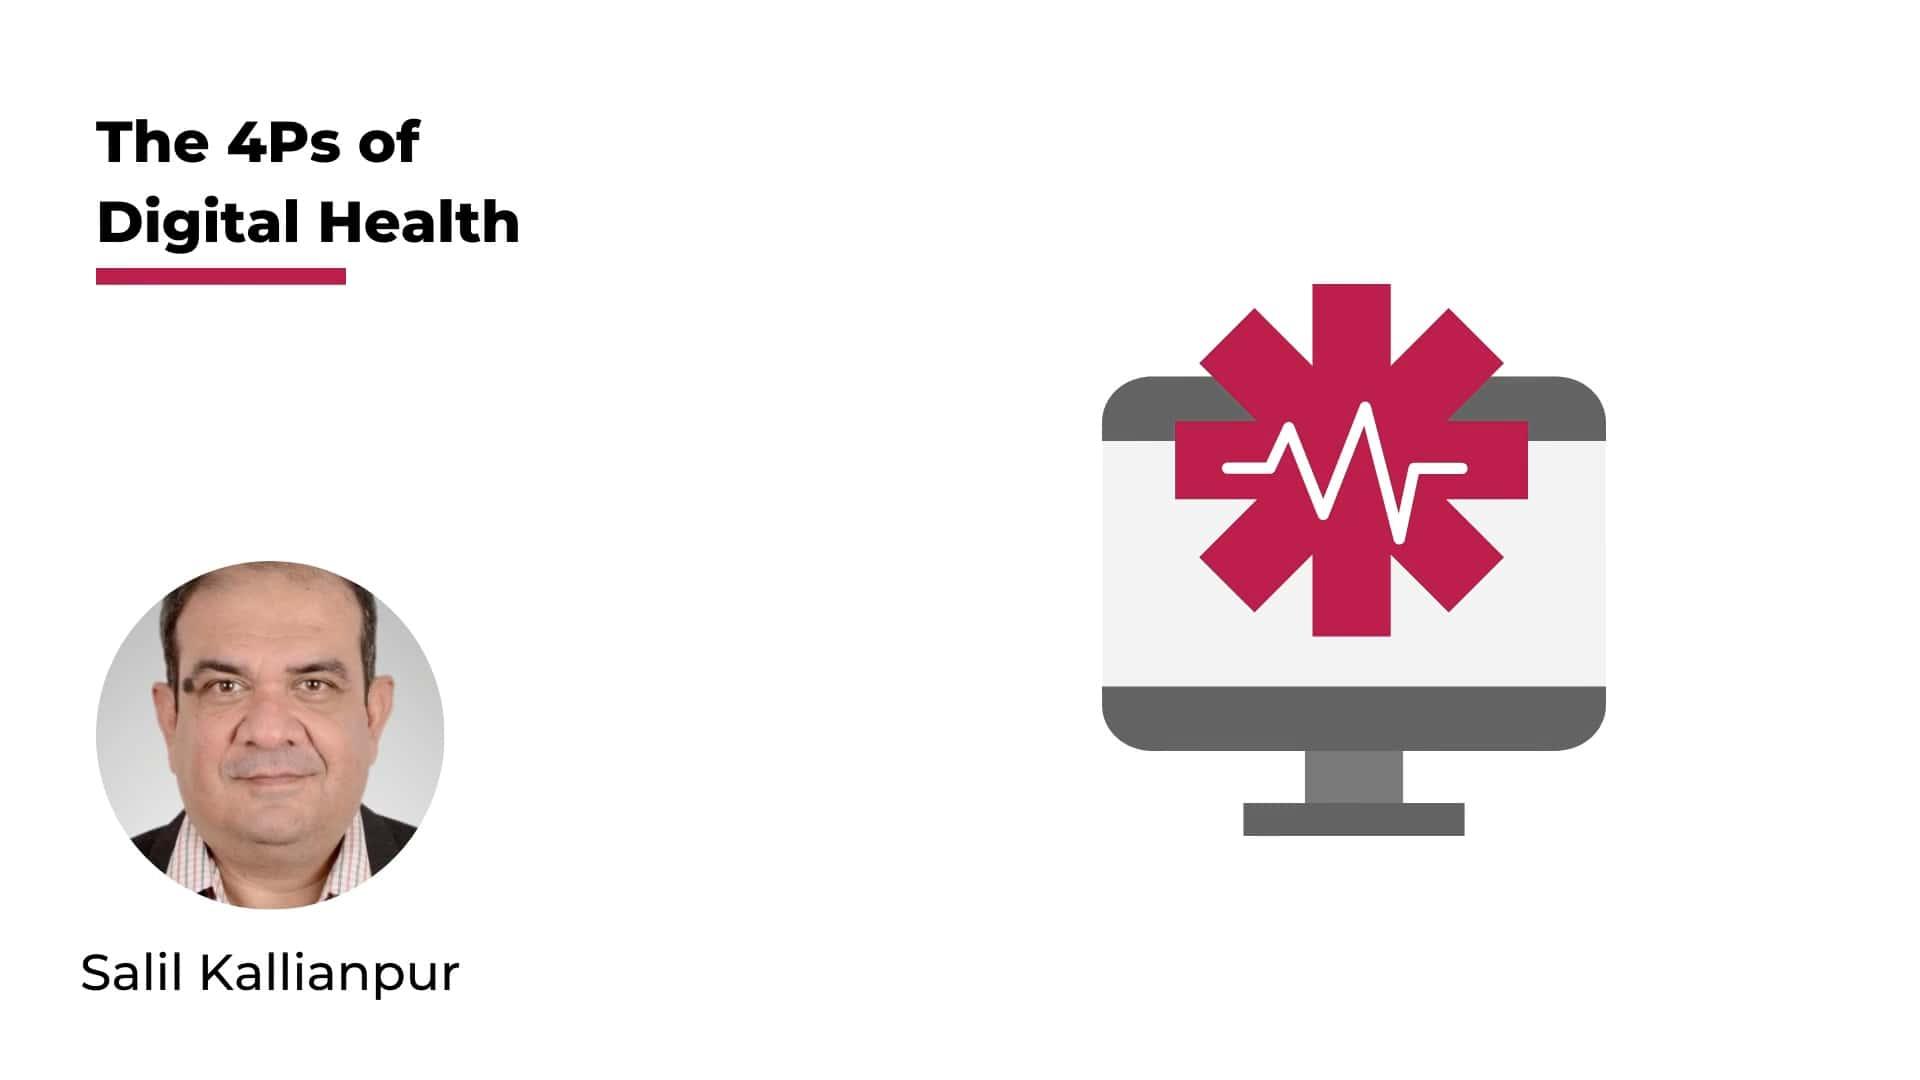 4Ps of Digital Health